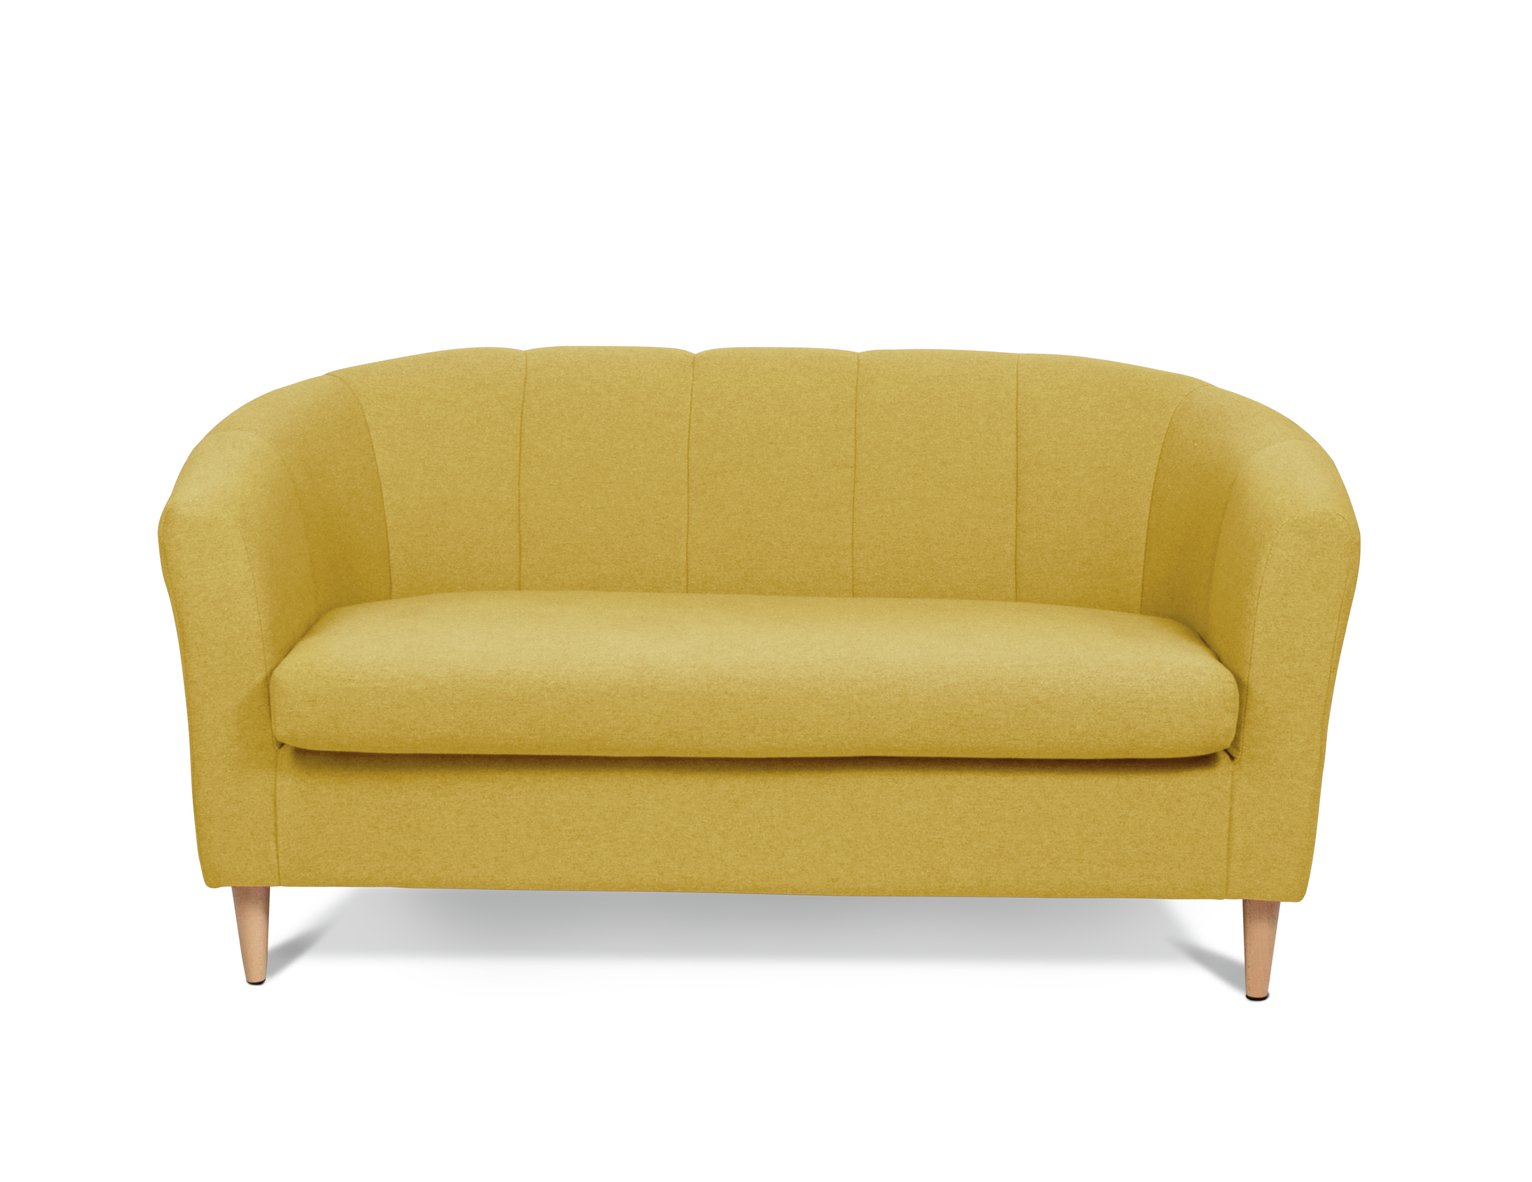 Argos Home Ayres 2 Seater Fabric Tub Sofa - Yellow